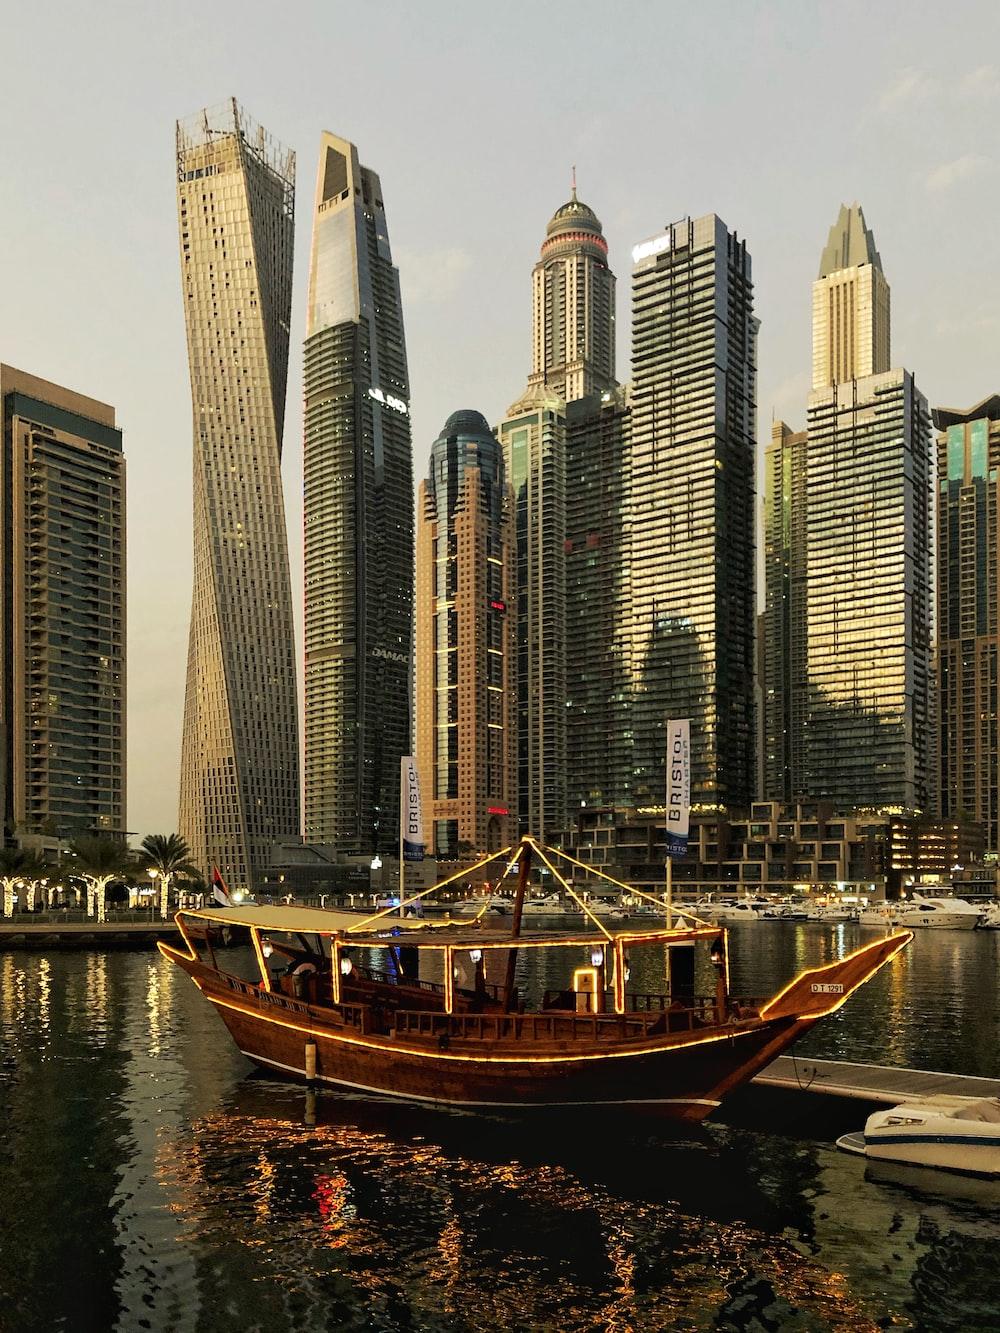 boat sailing near high-rise buildings